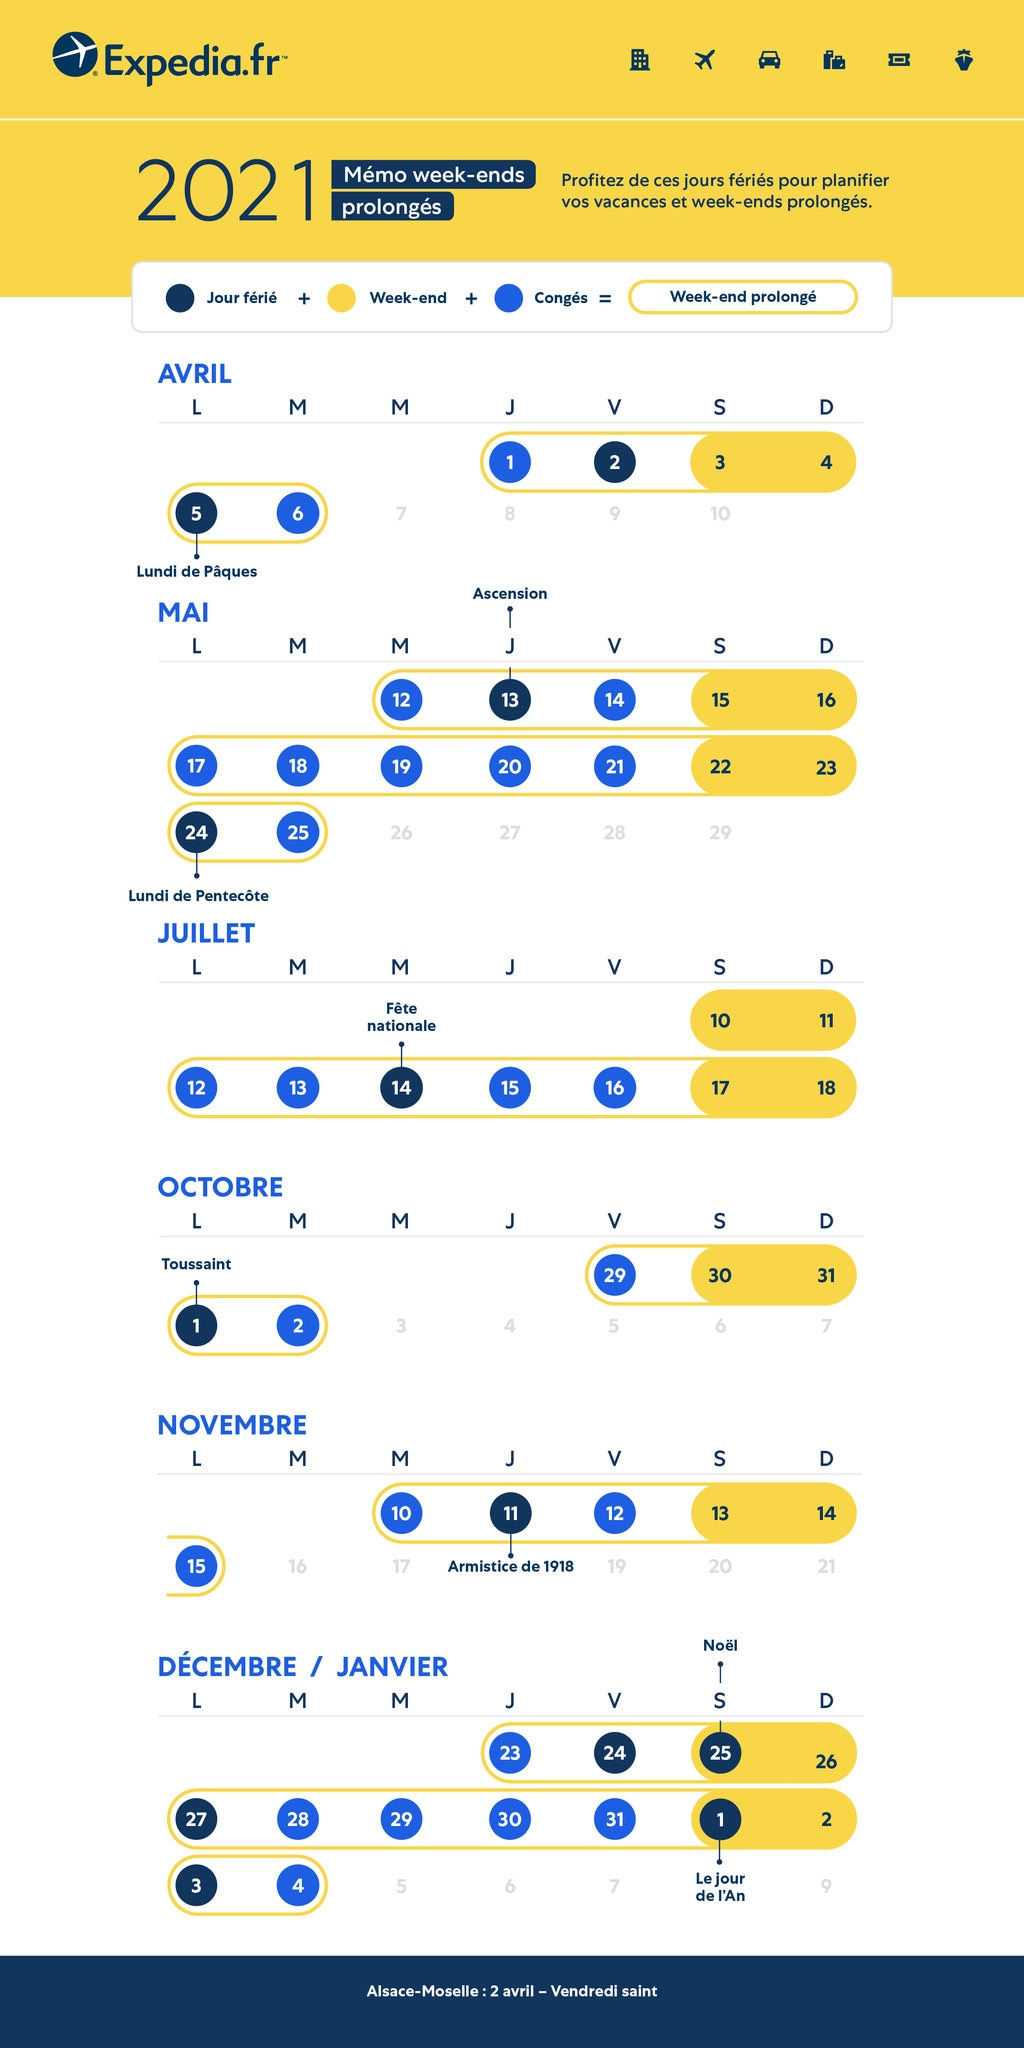 France-Expedia-2021_Long_Weekend_Planning_Calendars-Infographic-v2.jpg?1610489398